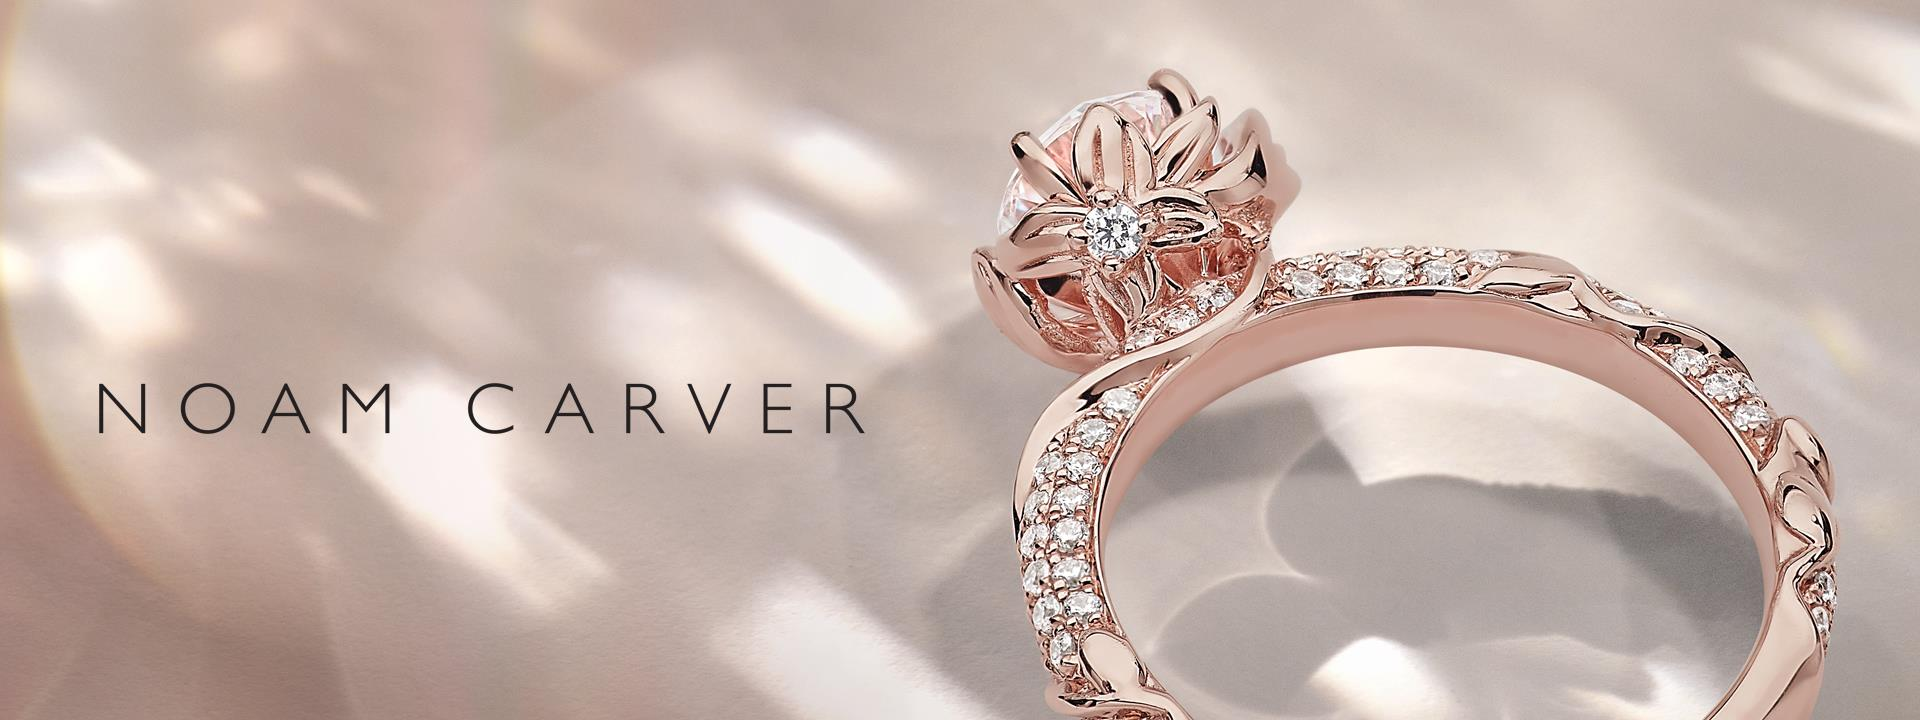 Skatells Jewelers: Diamonds, Engagement Rings, Rings, Diamond Rings